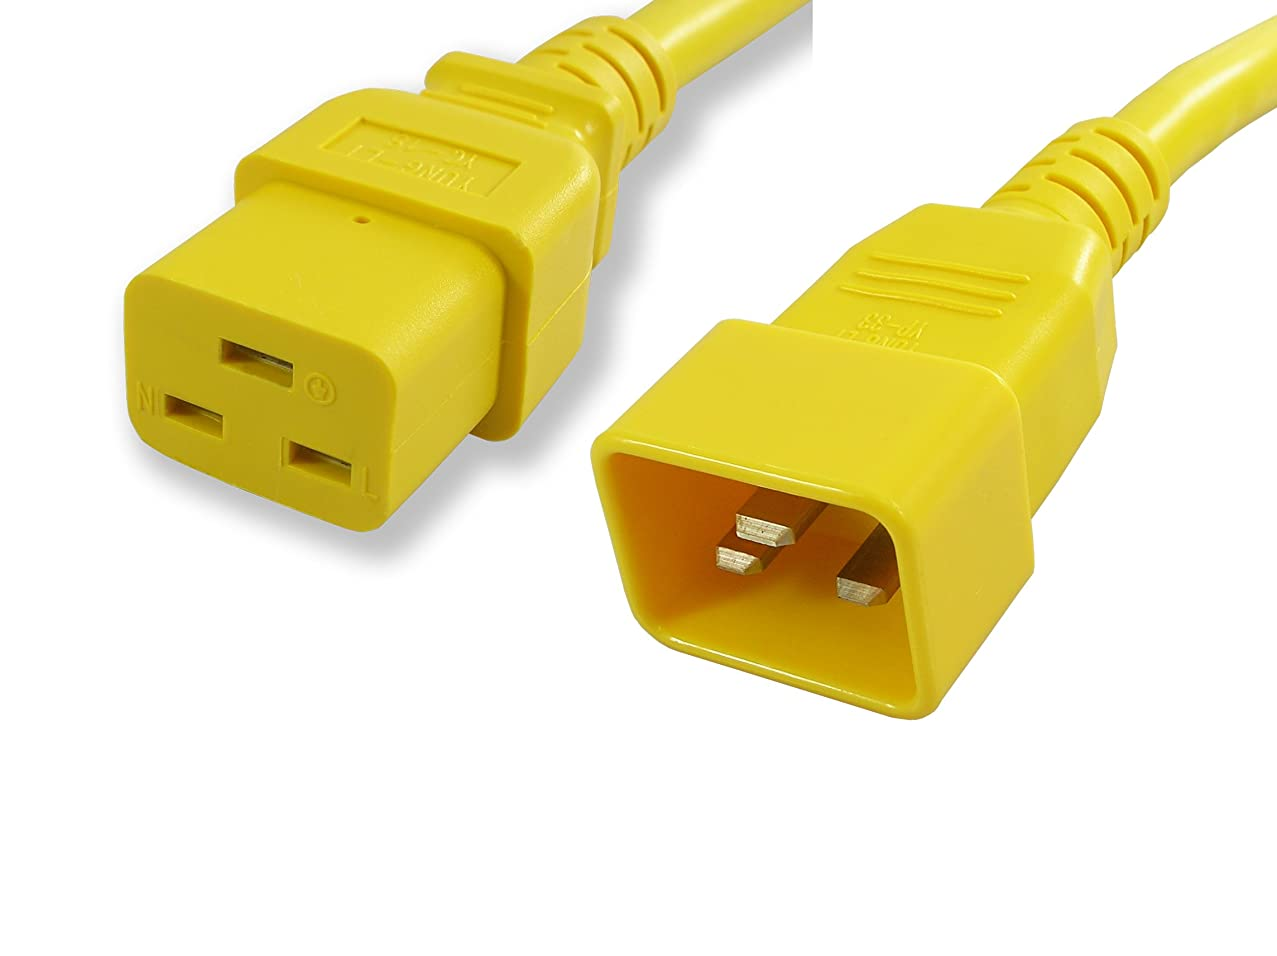 Lynn Electronics  C19C2020AYE-15F  20-Amp/250-volt  15-Feet Power Cord IEC 60320 C19 to IEC 60320 C20,  Yellow